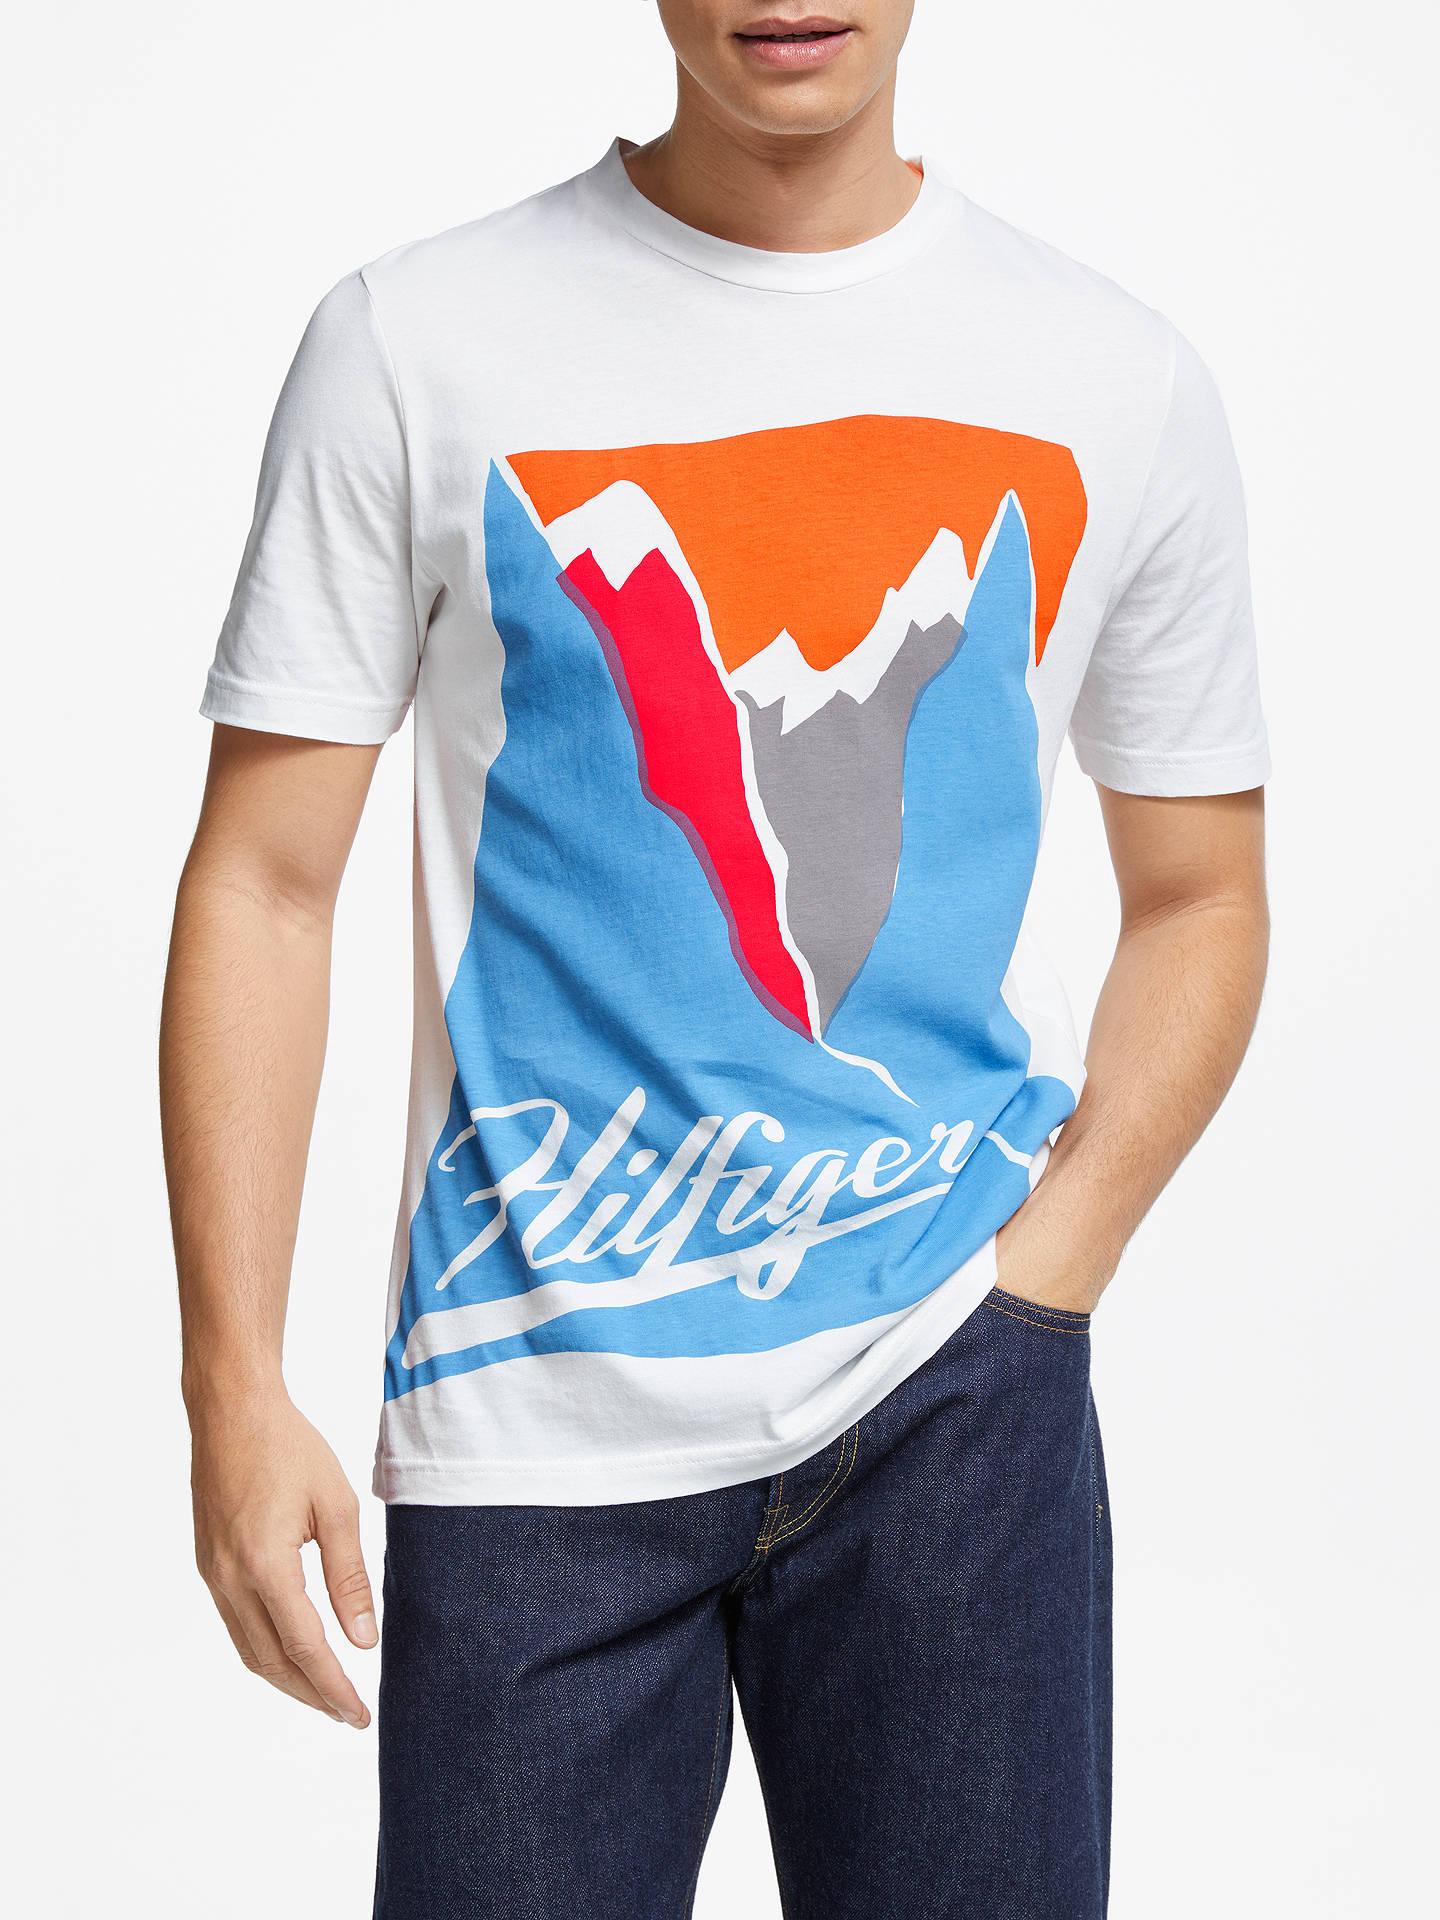 0c0ebb77d Buy Tommy Hilfiger Mountain Print T-Shirt